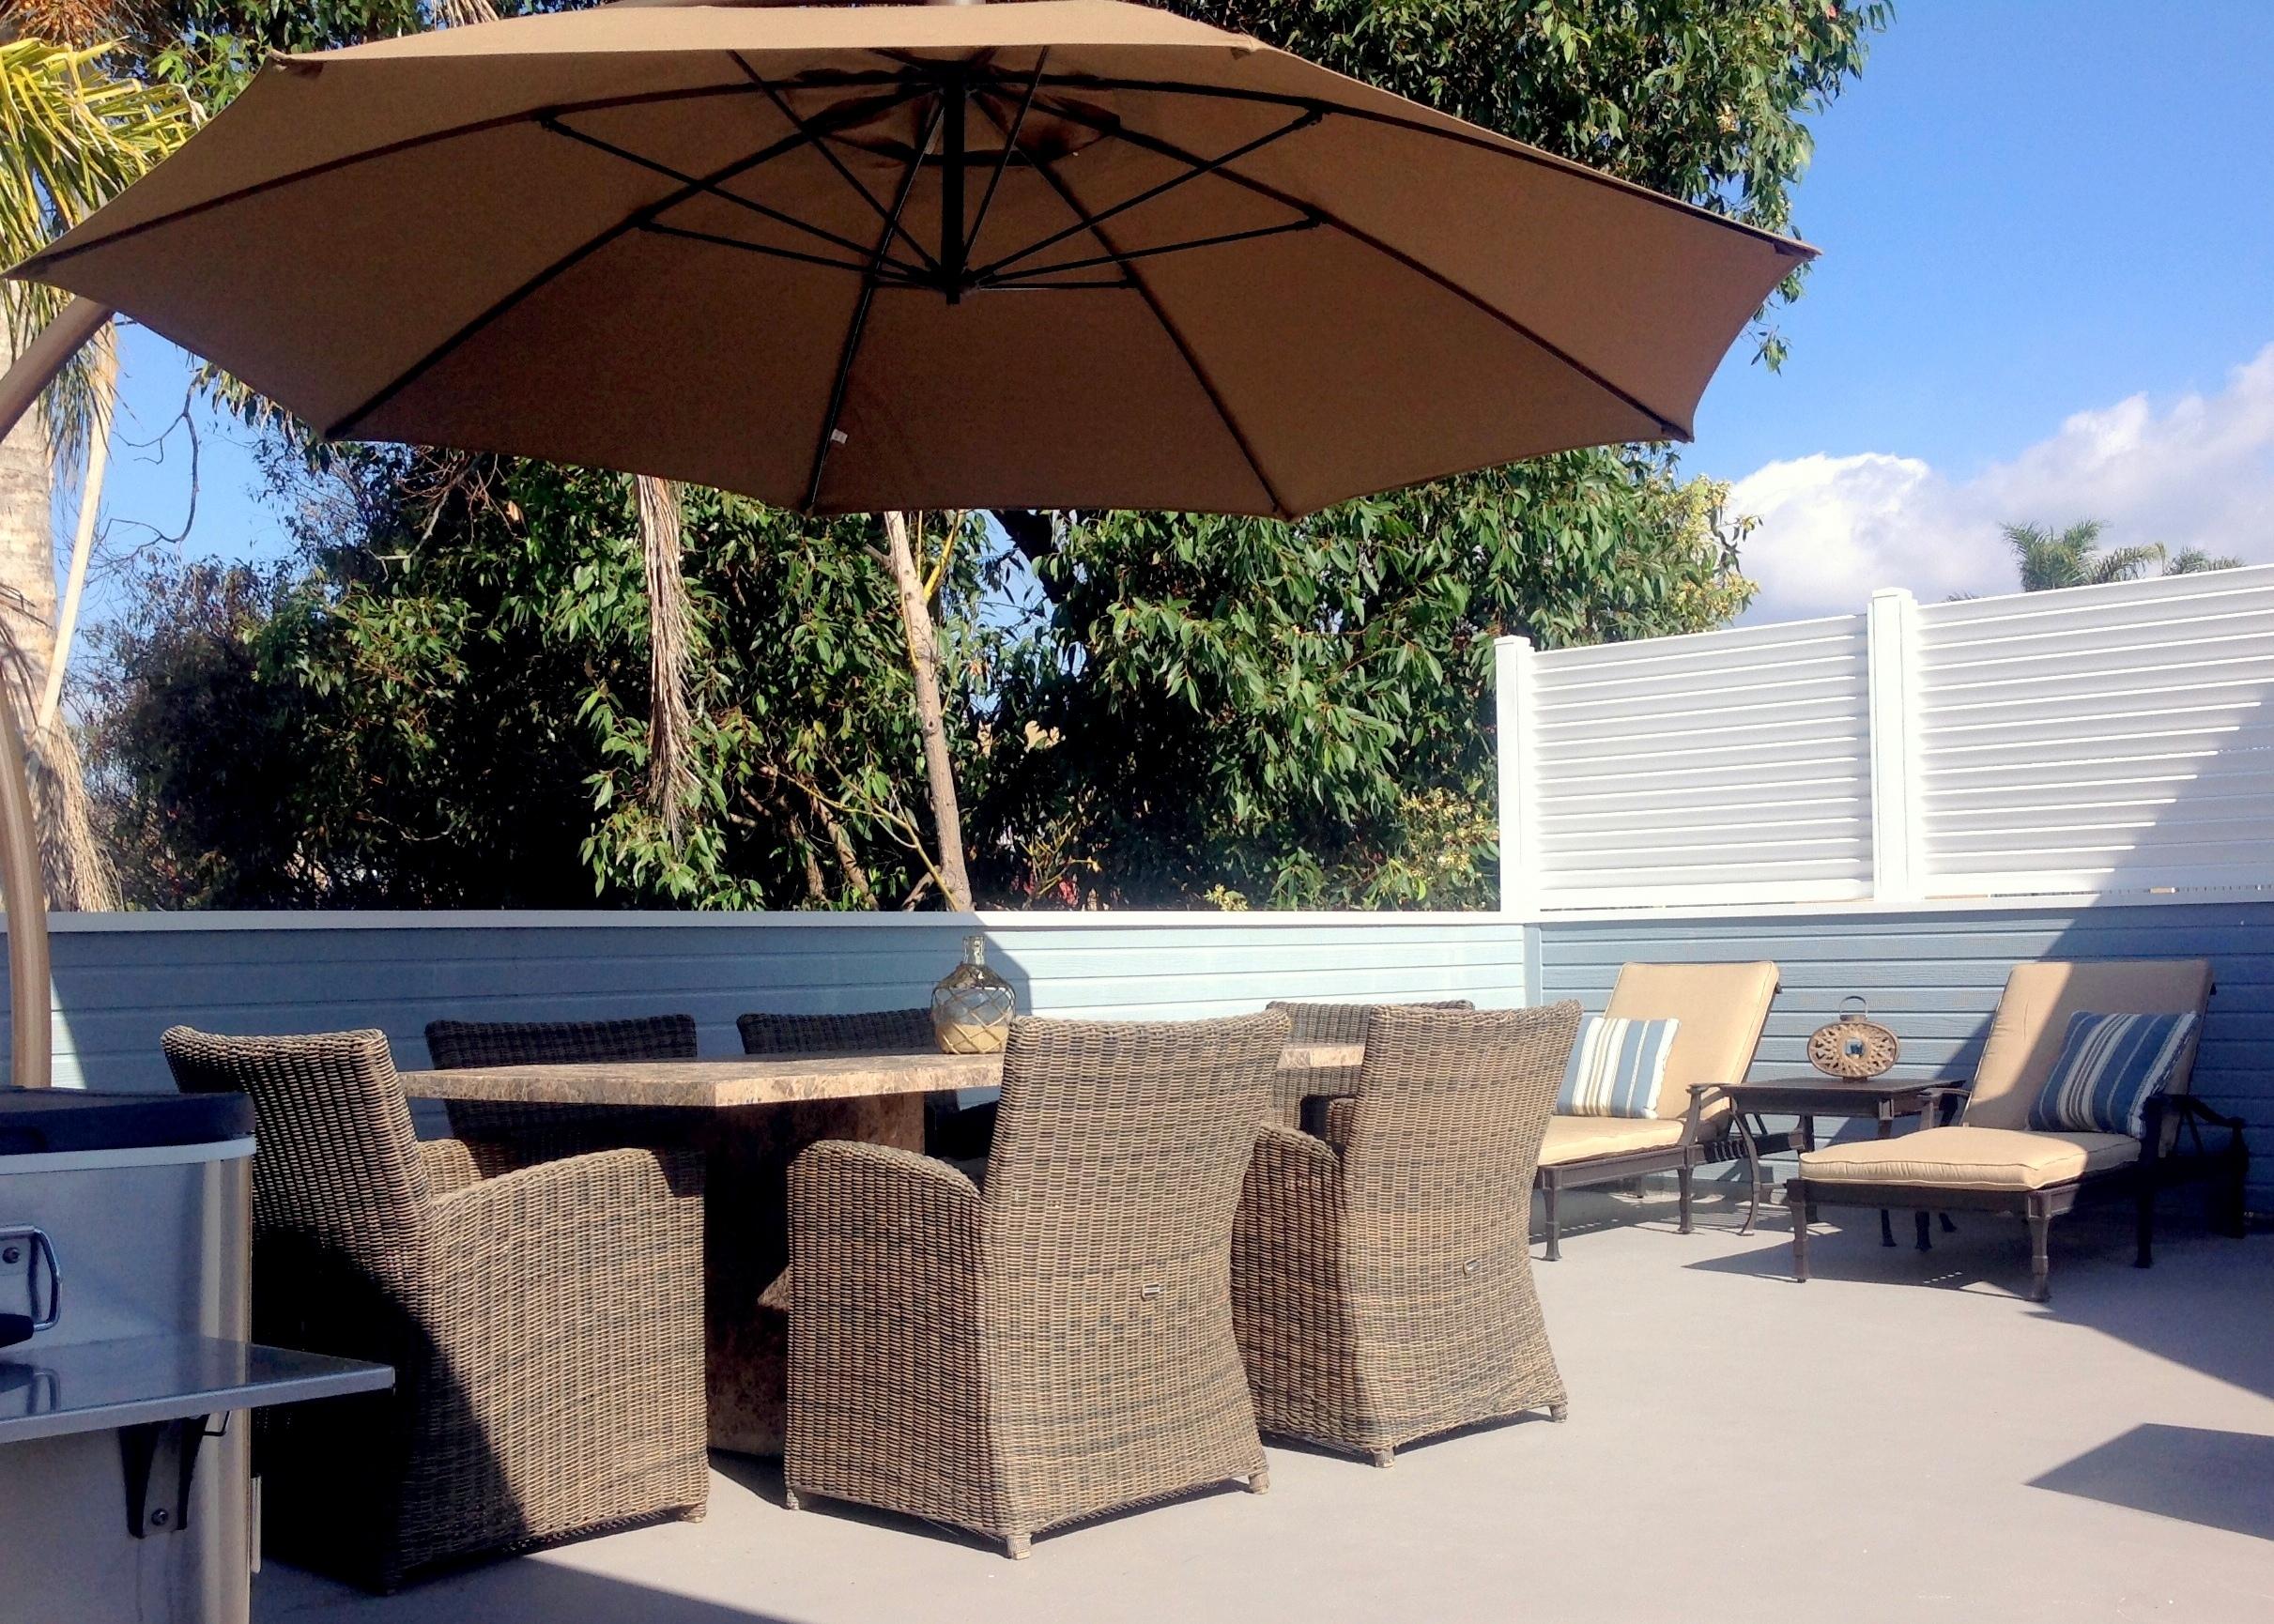 4BR 5BA Luxury Beach House Ventura CA RA